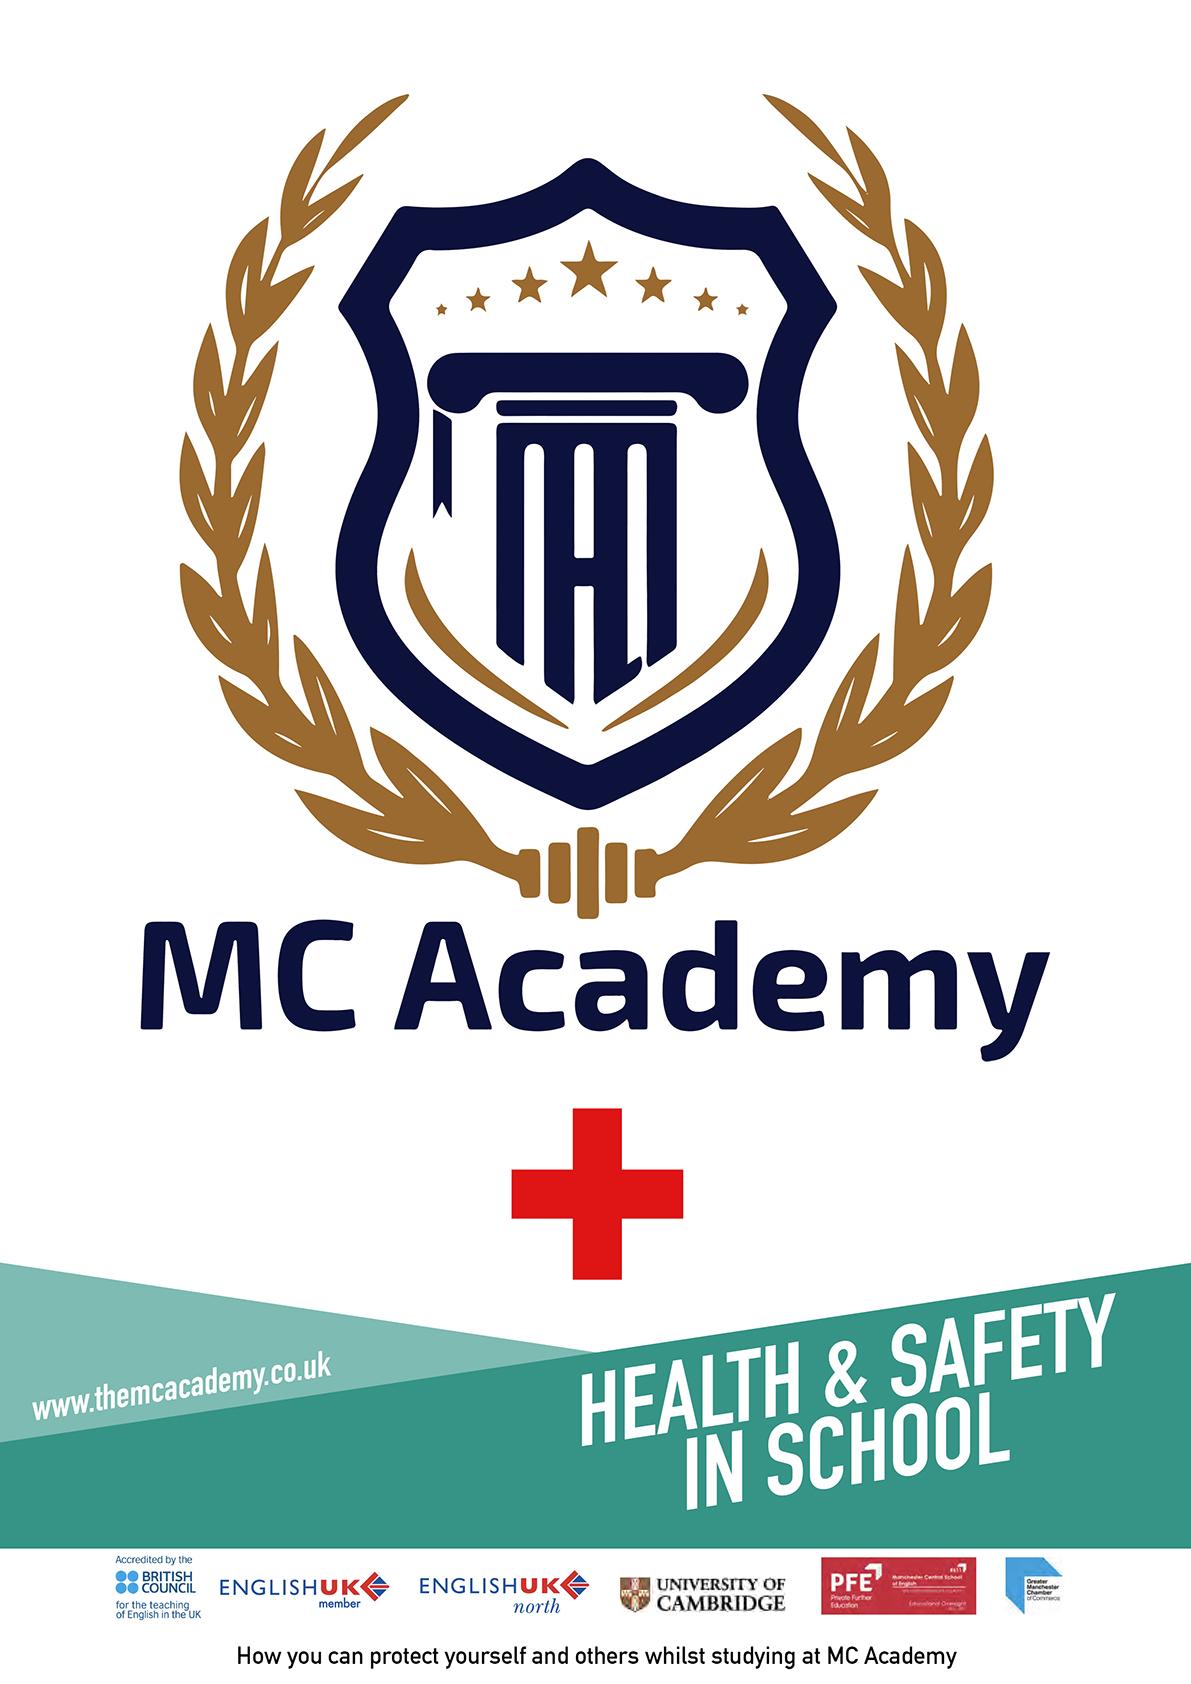 Health & Safety in School